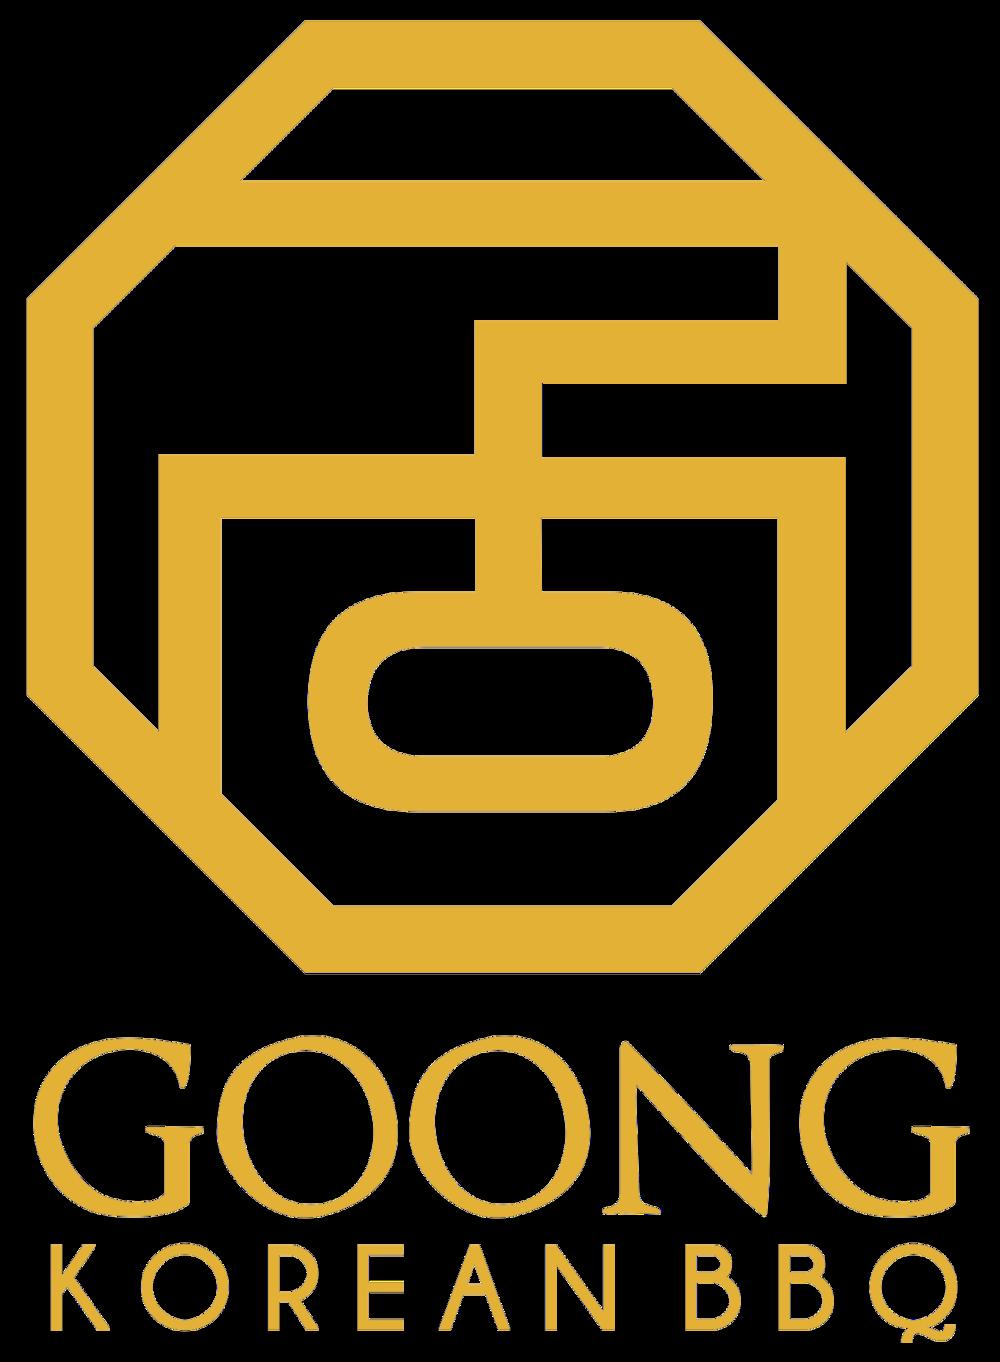 goong logo (small gold).png